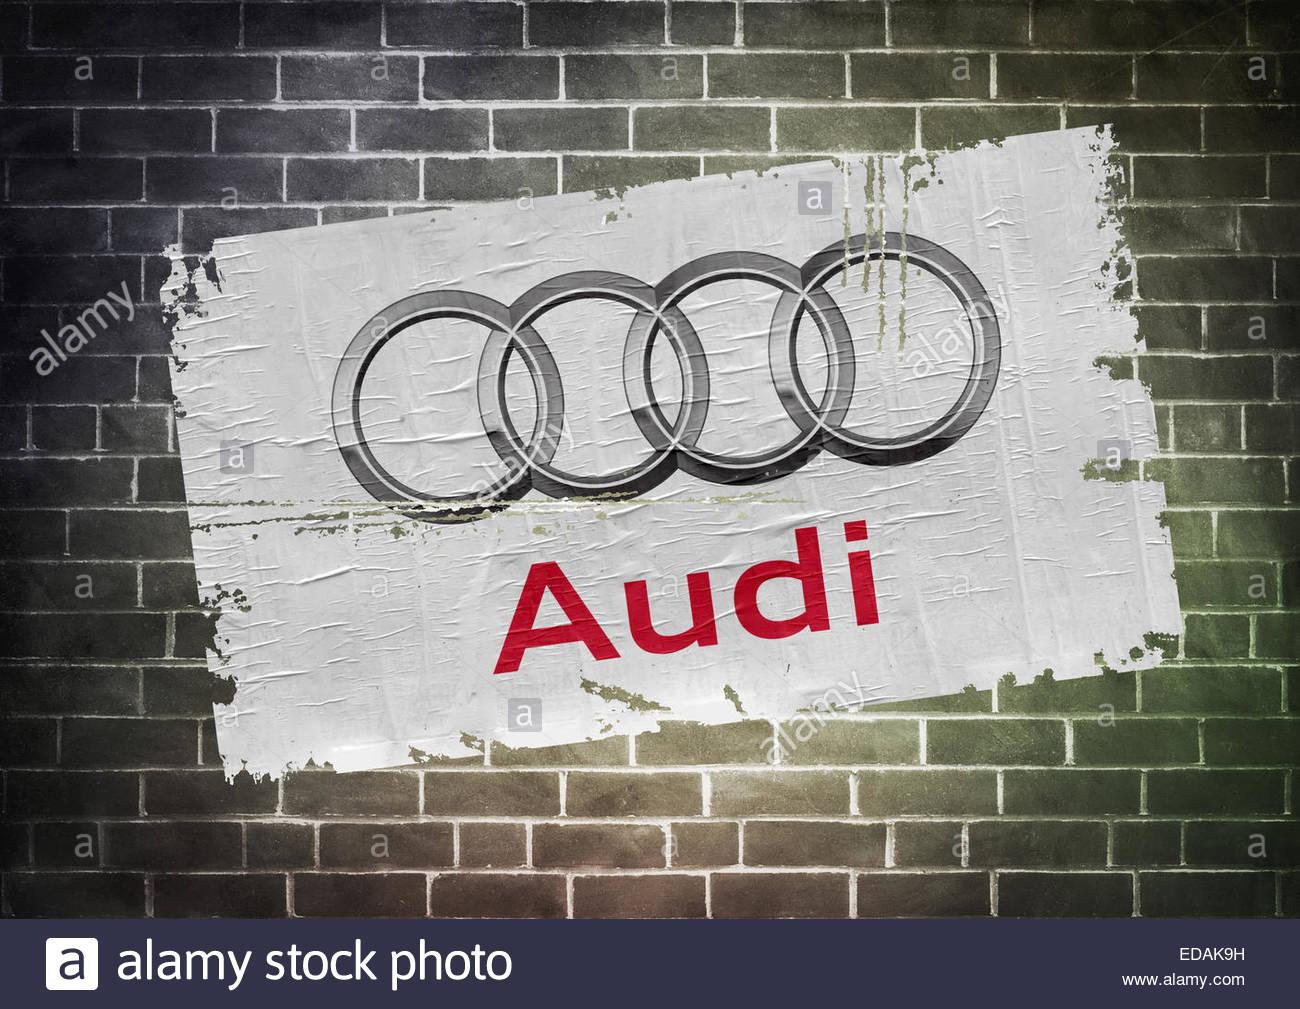 Audi logo icon poster - Stock Image